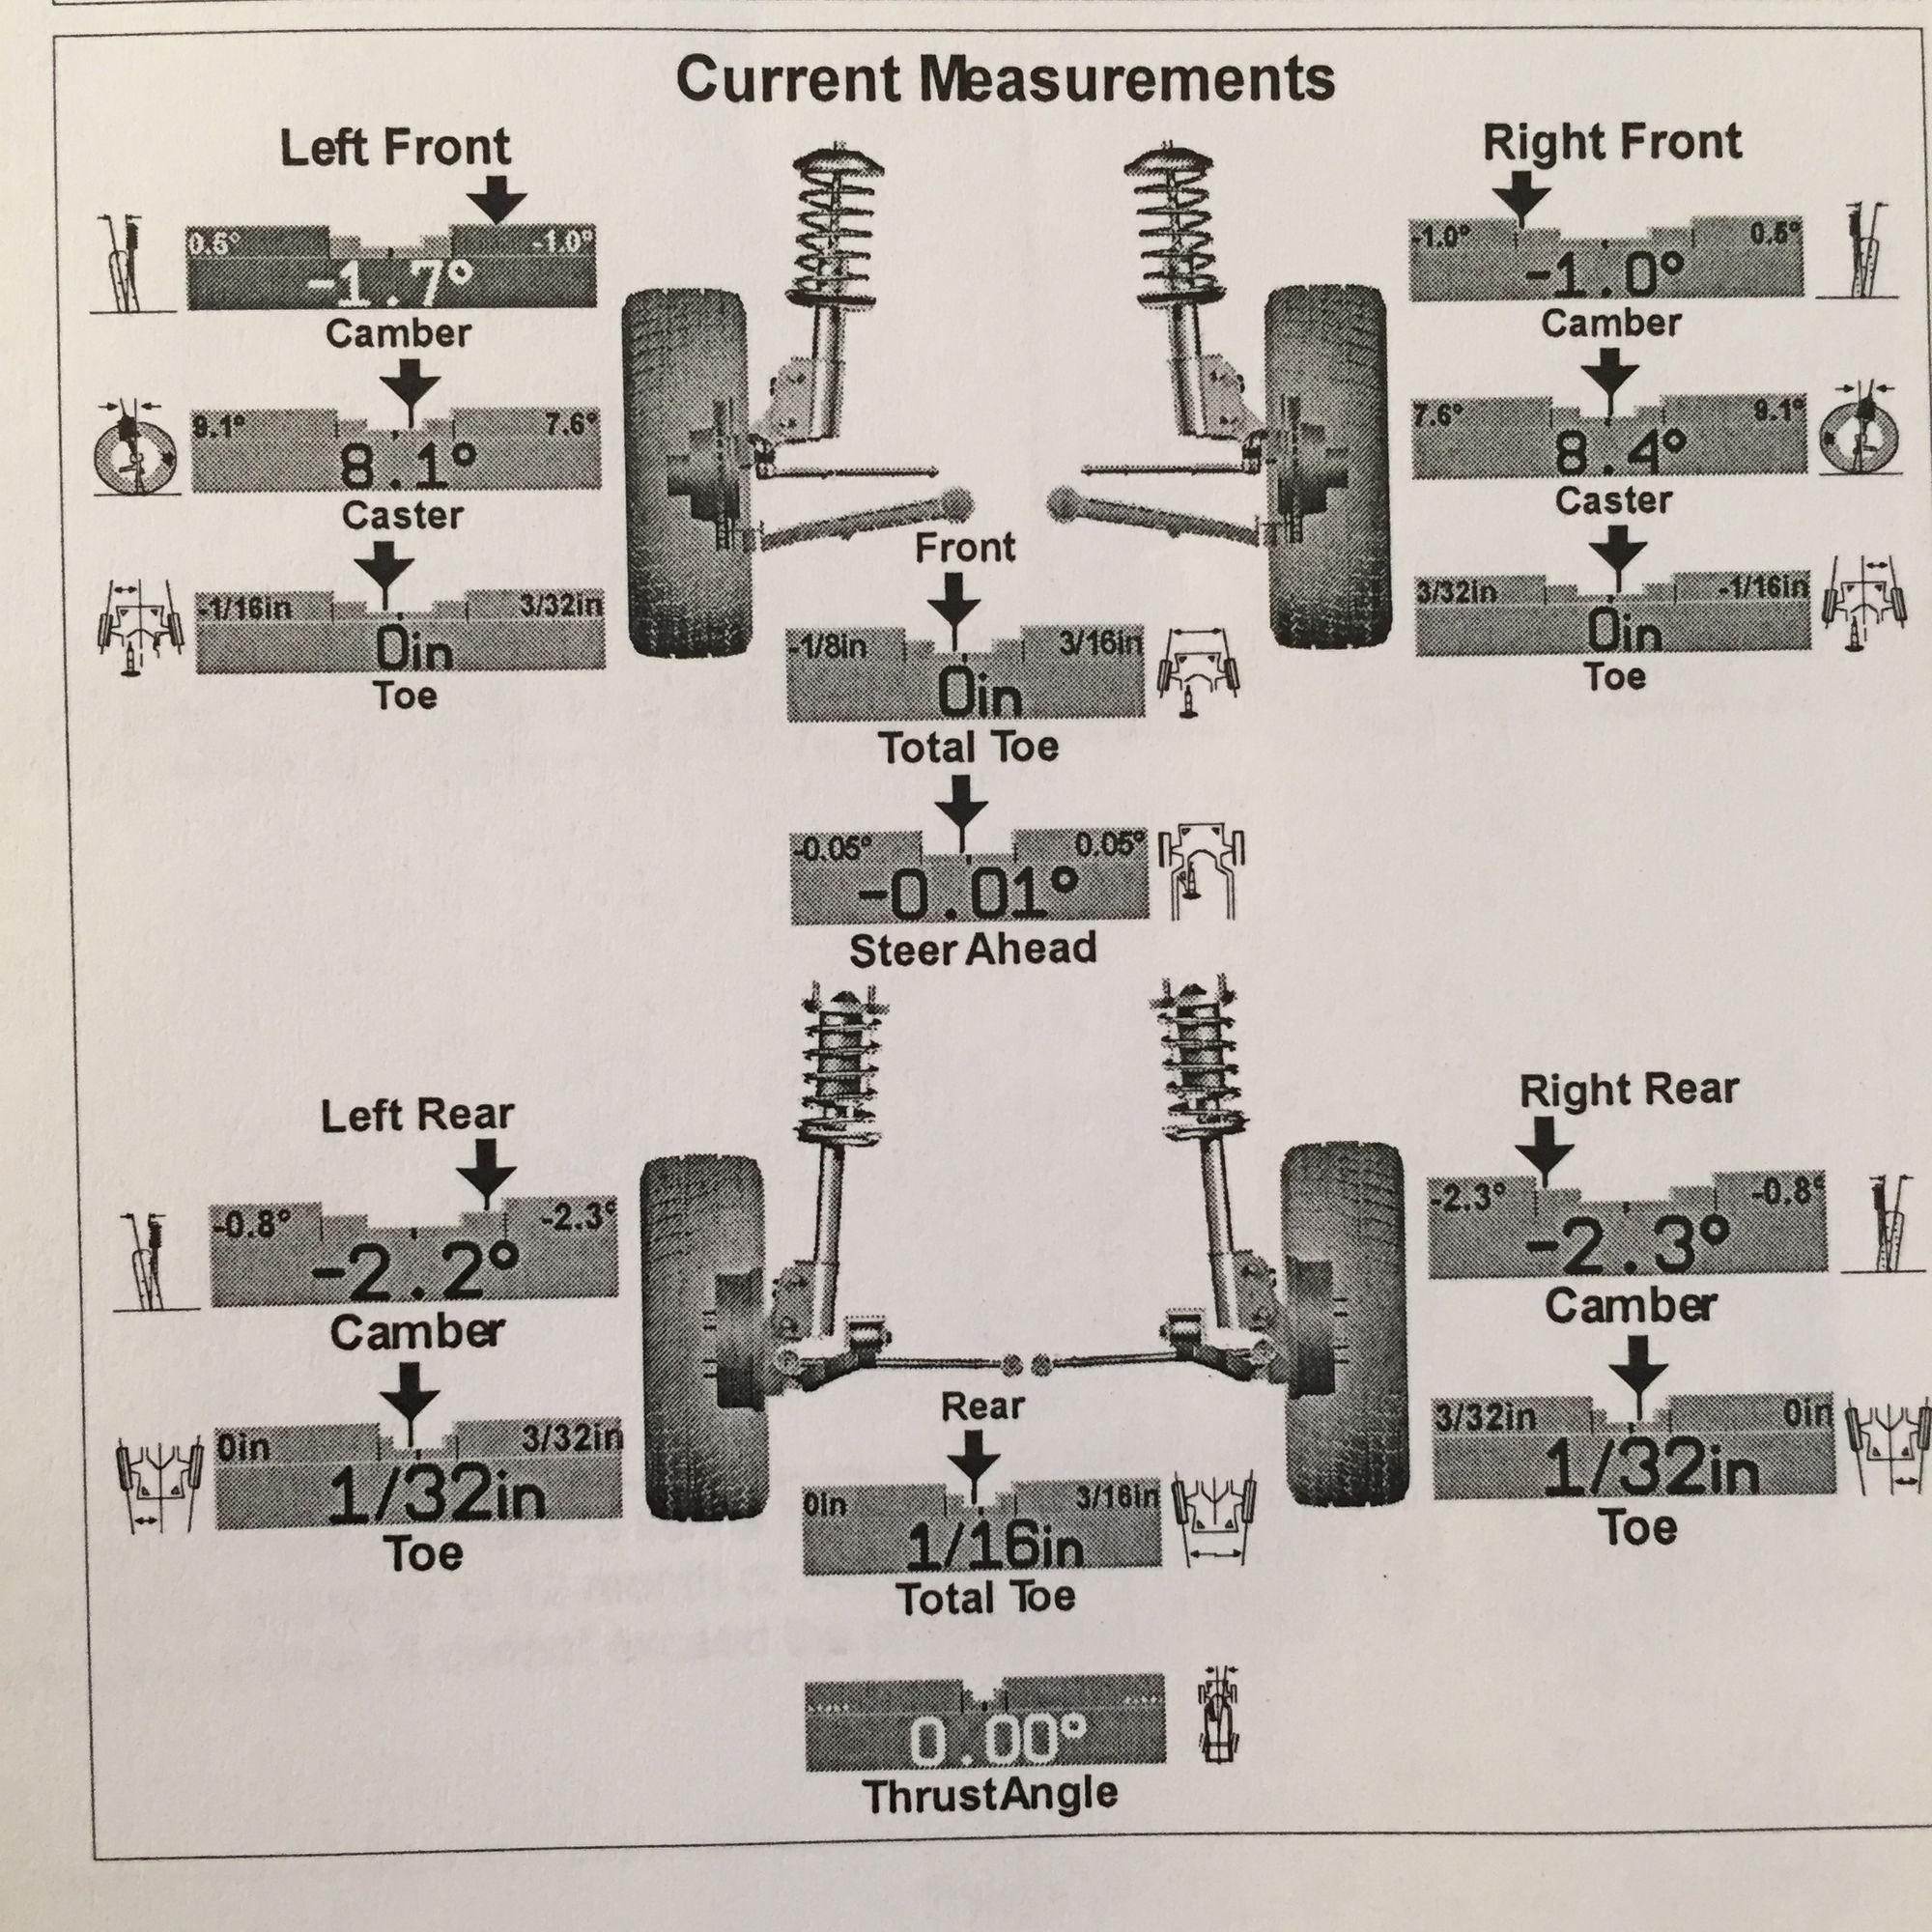 Lexus Richmond Hill >> Camber adjustment questions. Please help - ClubLexus - Lexus Forum Discussion